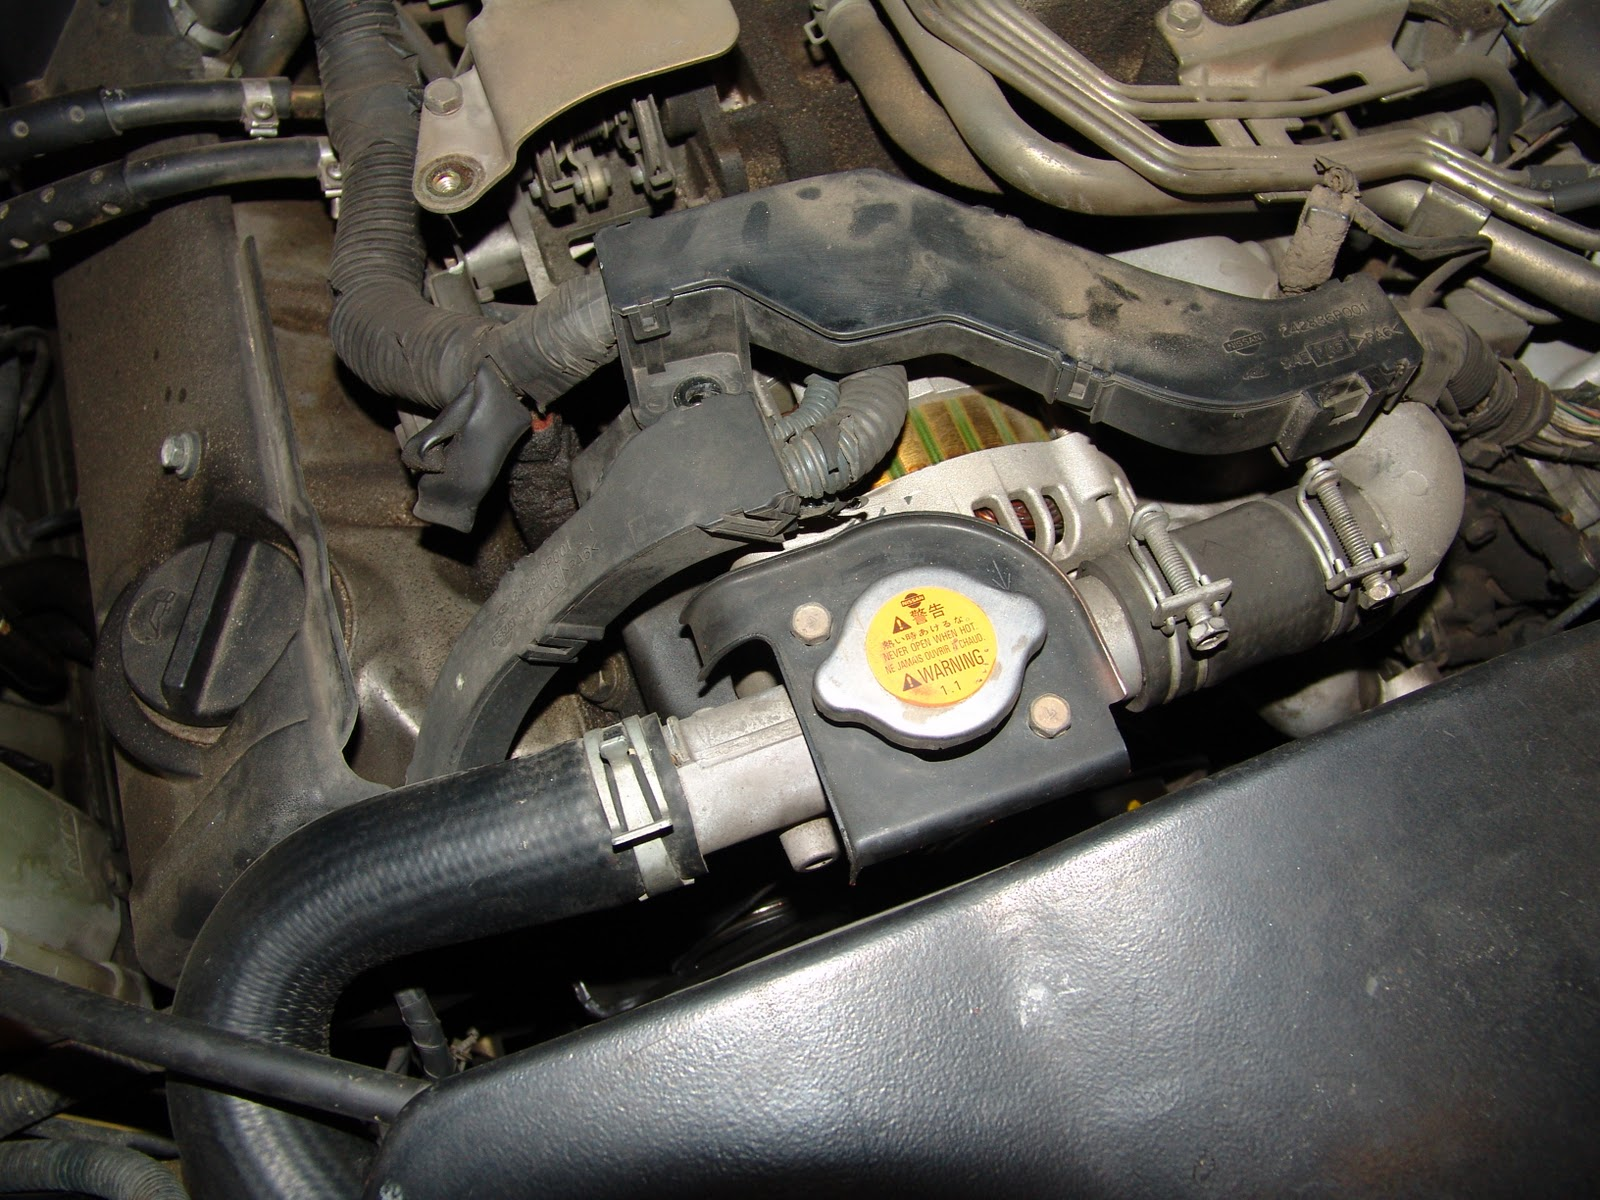 2006 honda civic alternator wiring diagram motorcycle cdi ignition thermostat location 2003 pilot free